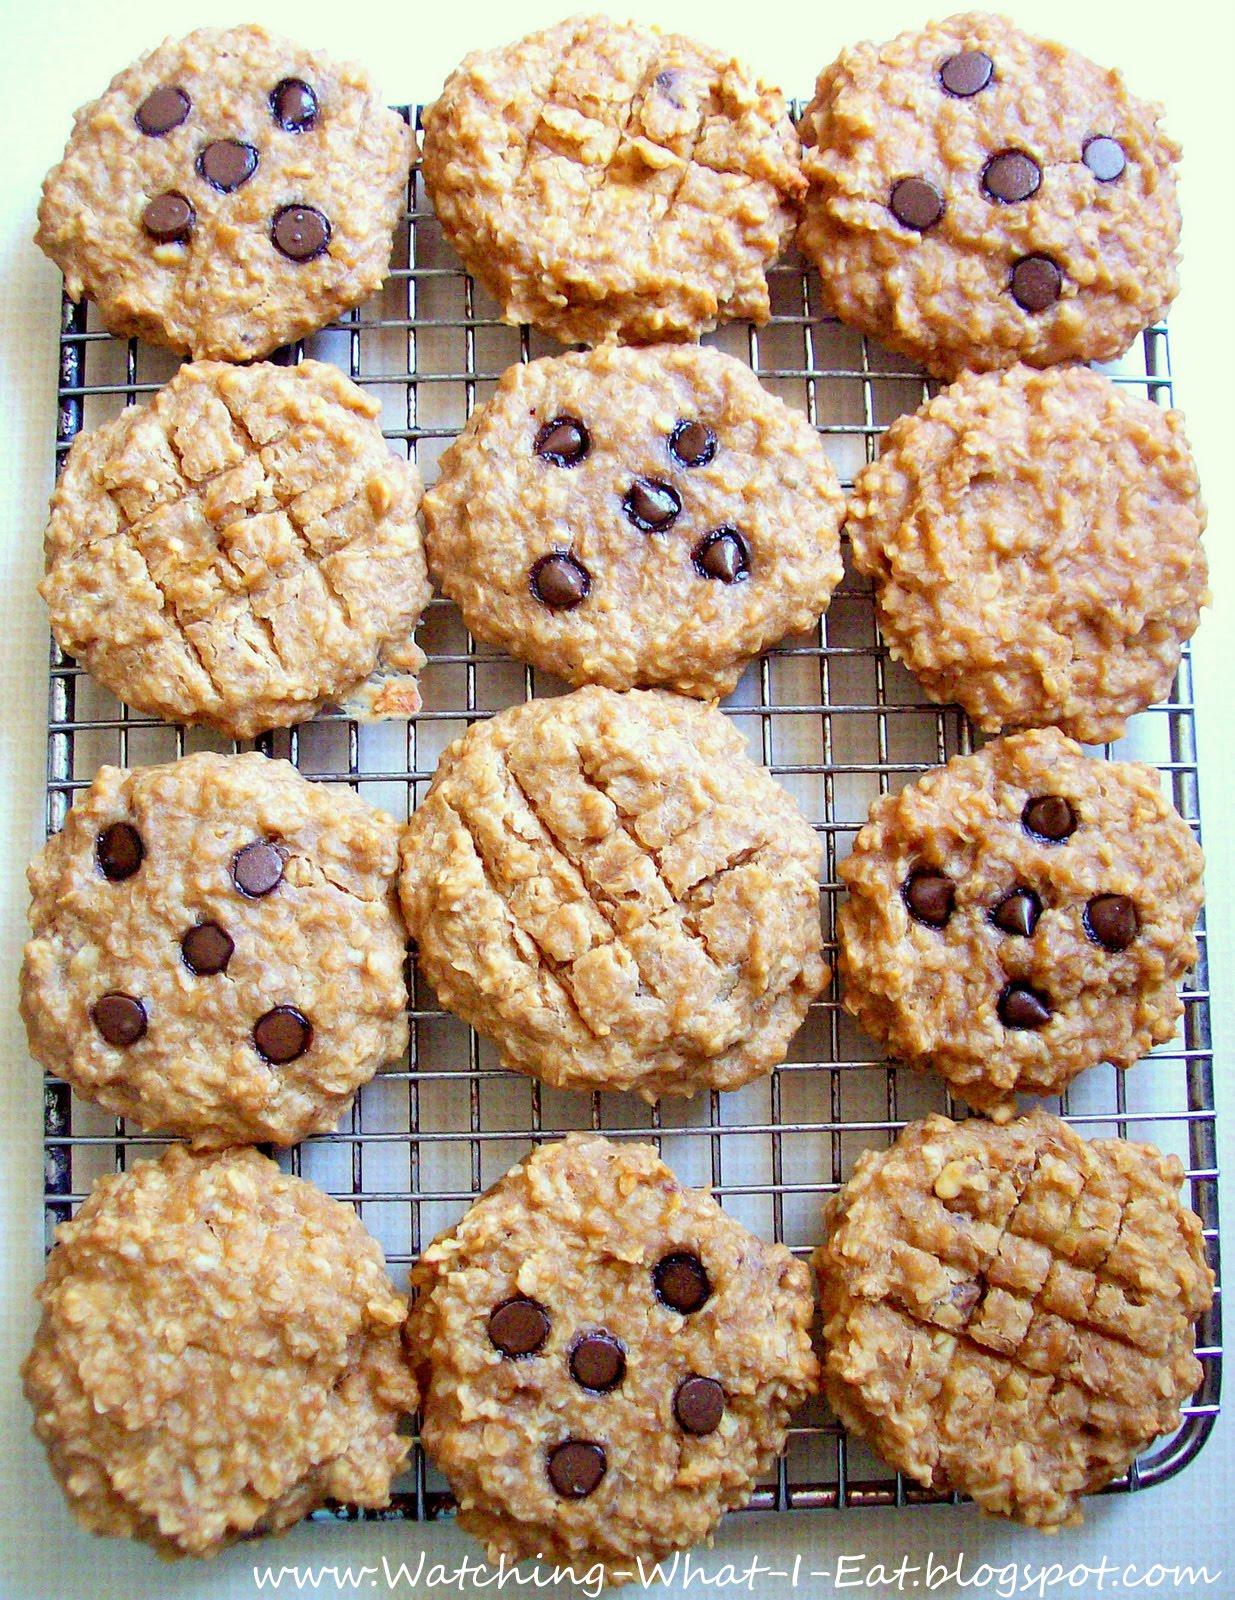 Applesauce banana cookie recipe